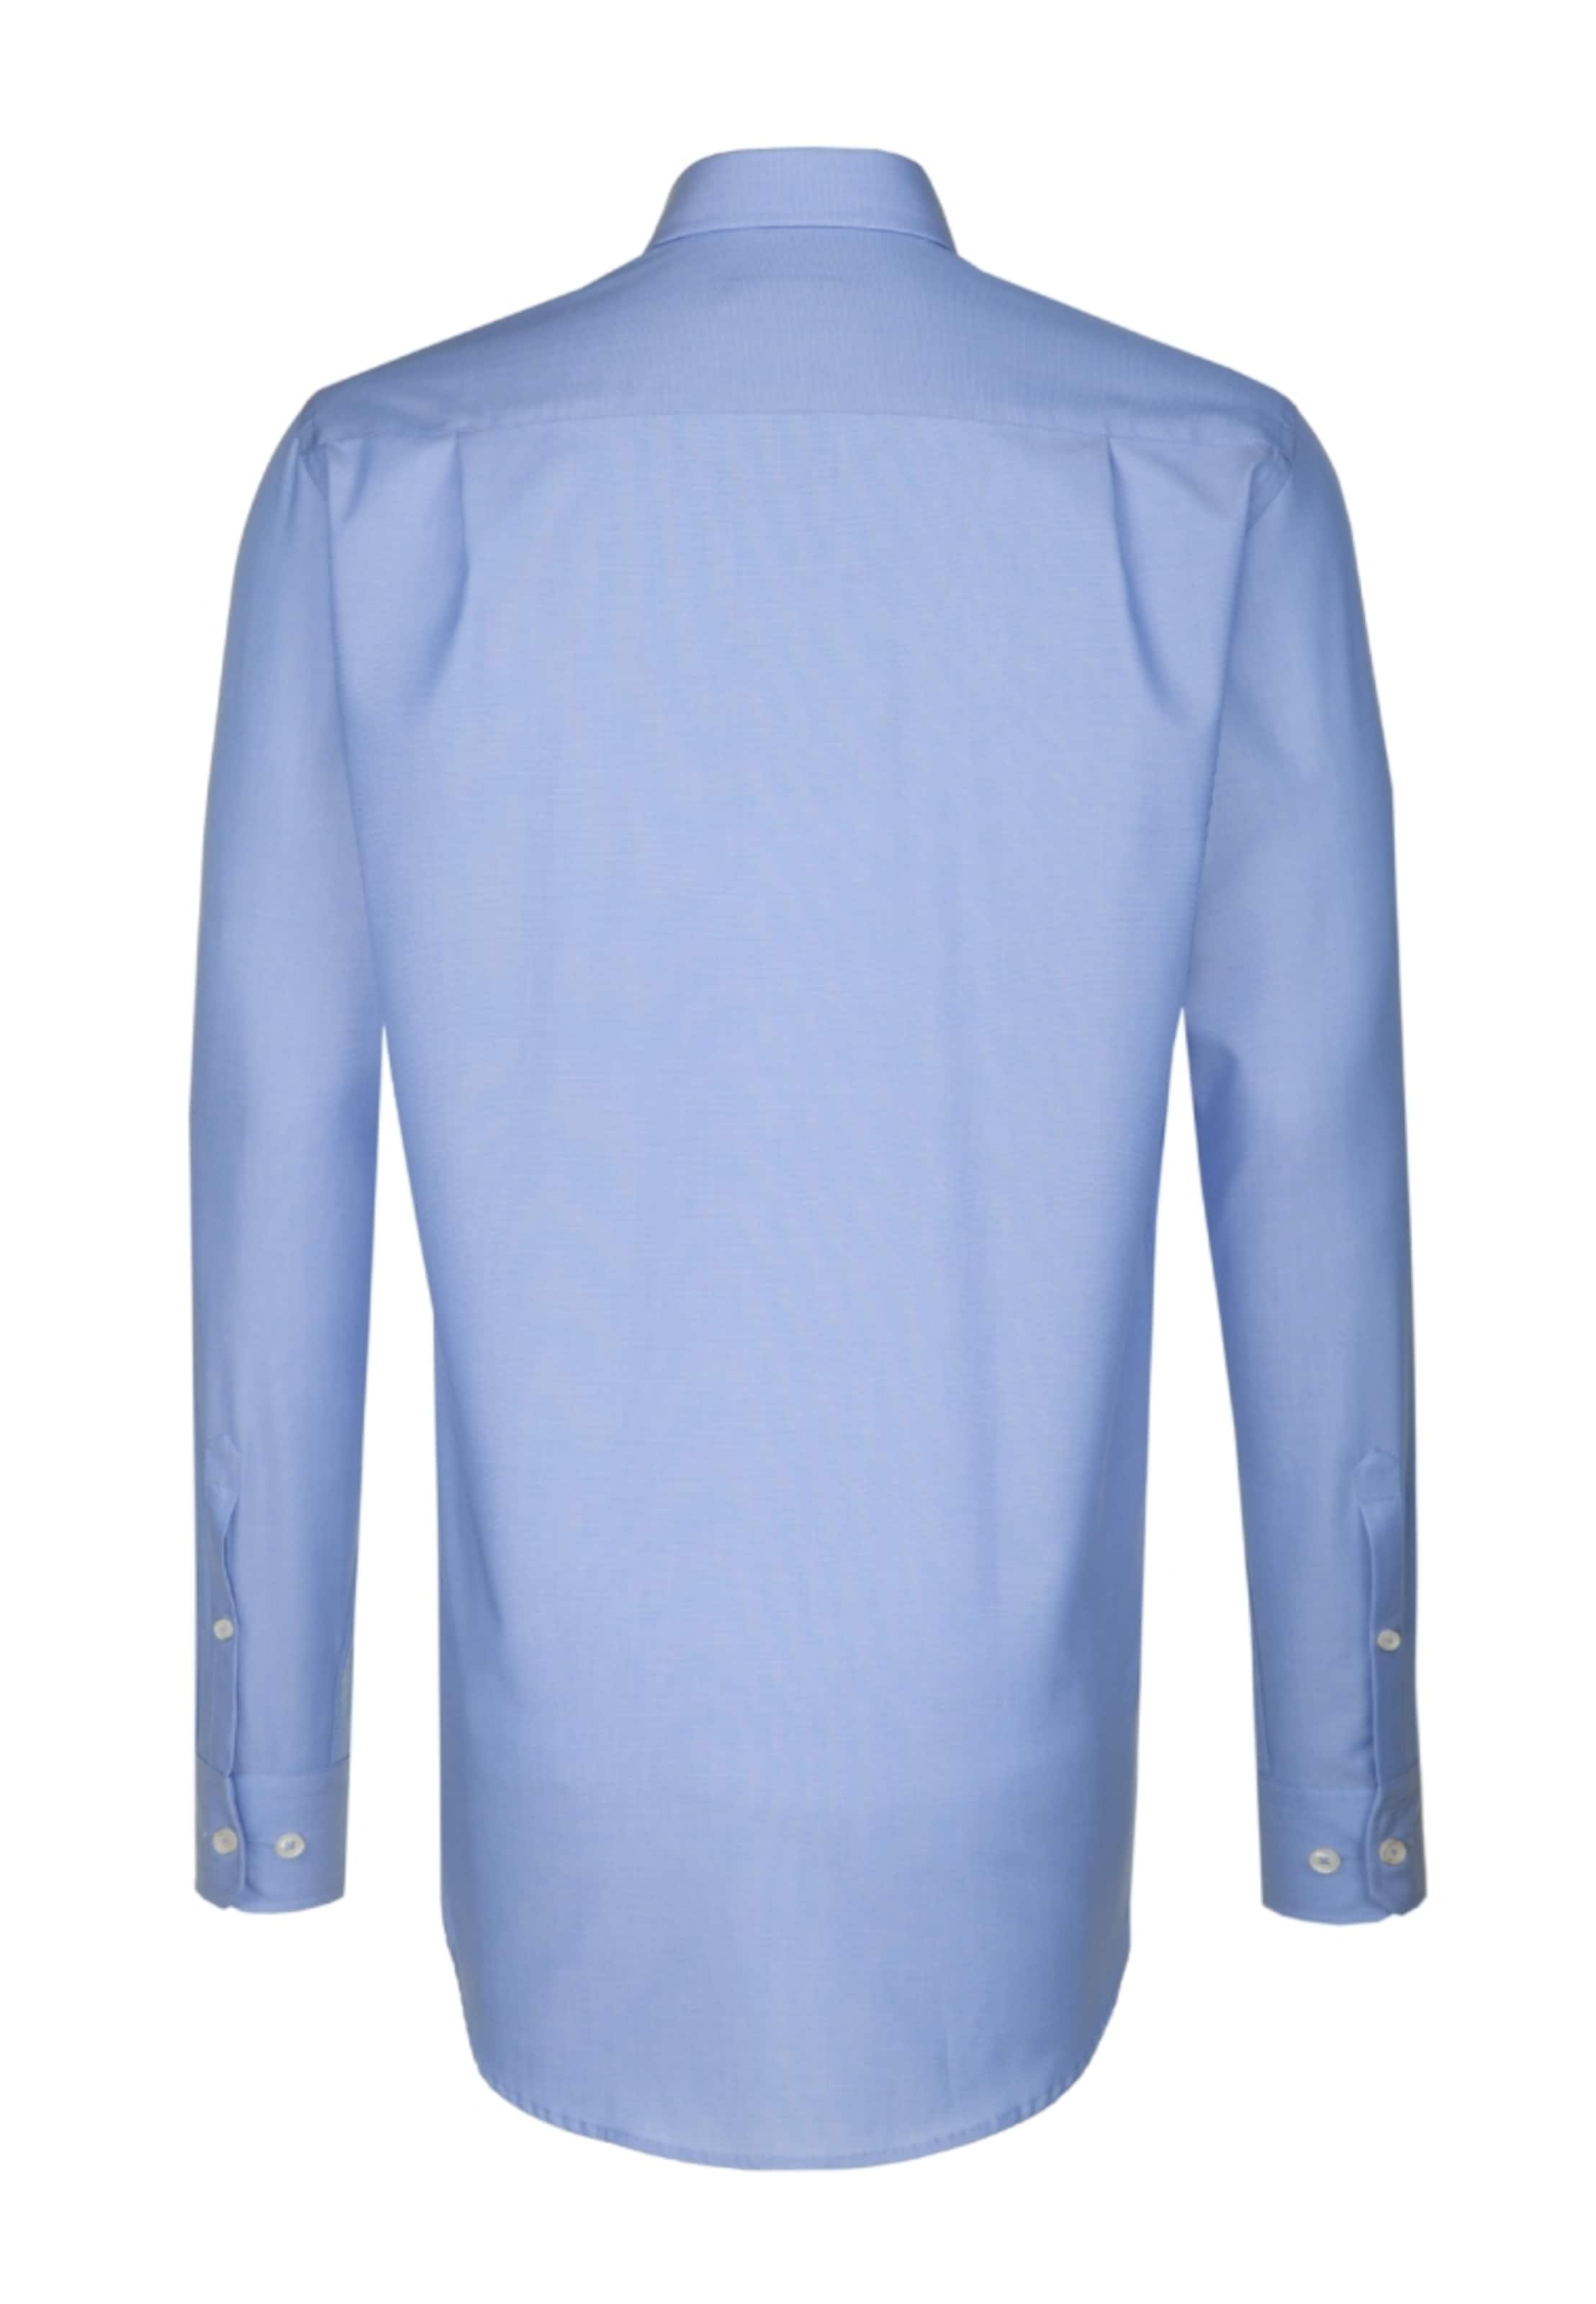 'modern' Blau City hemd In Seidensticker JFcT1lK